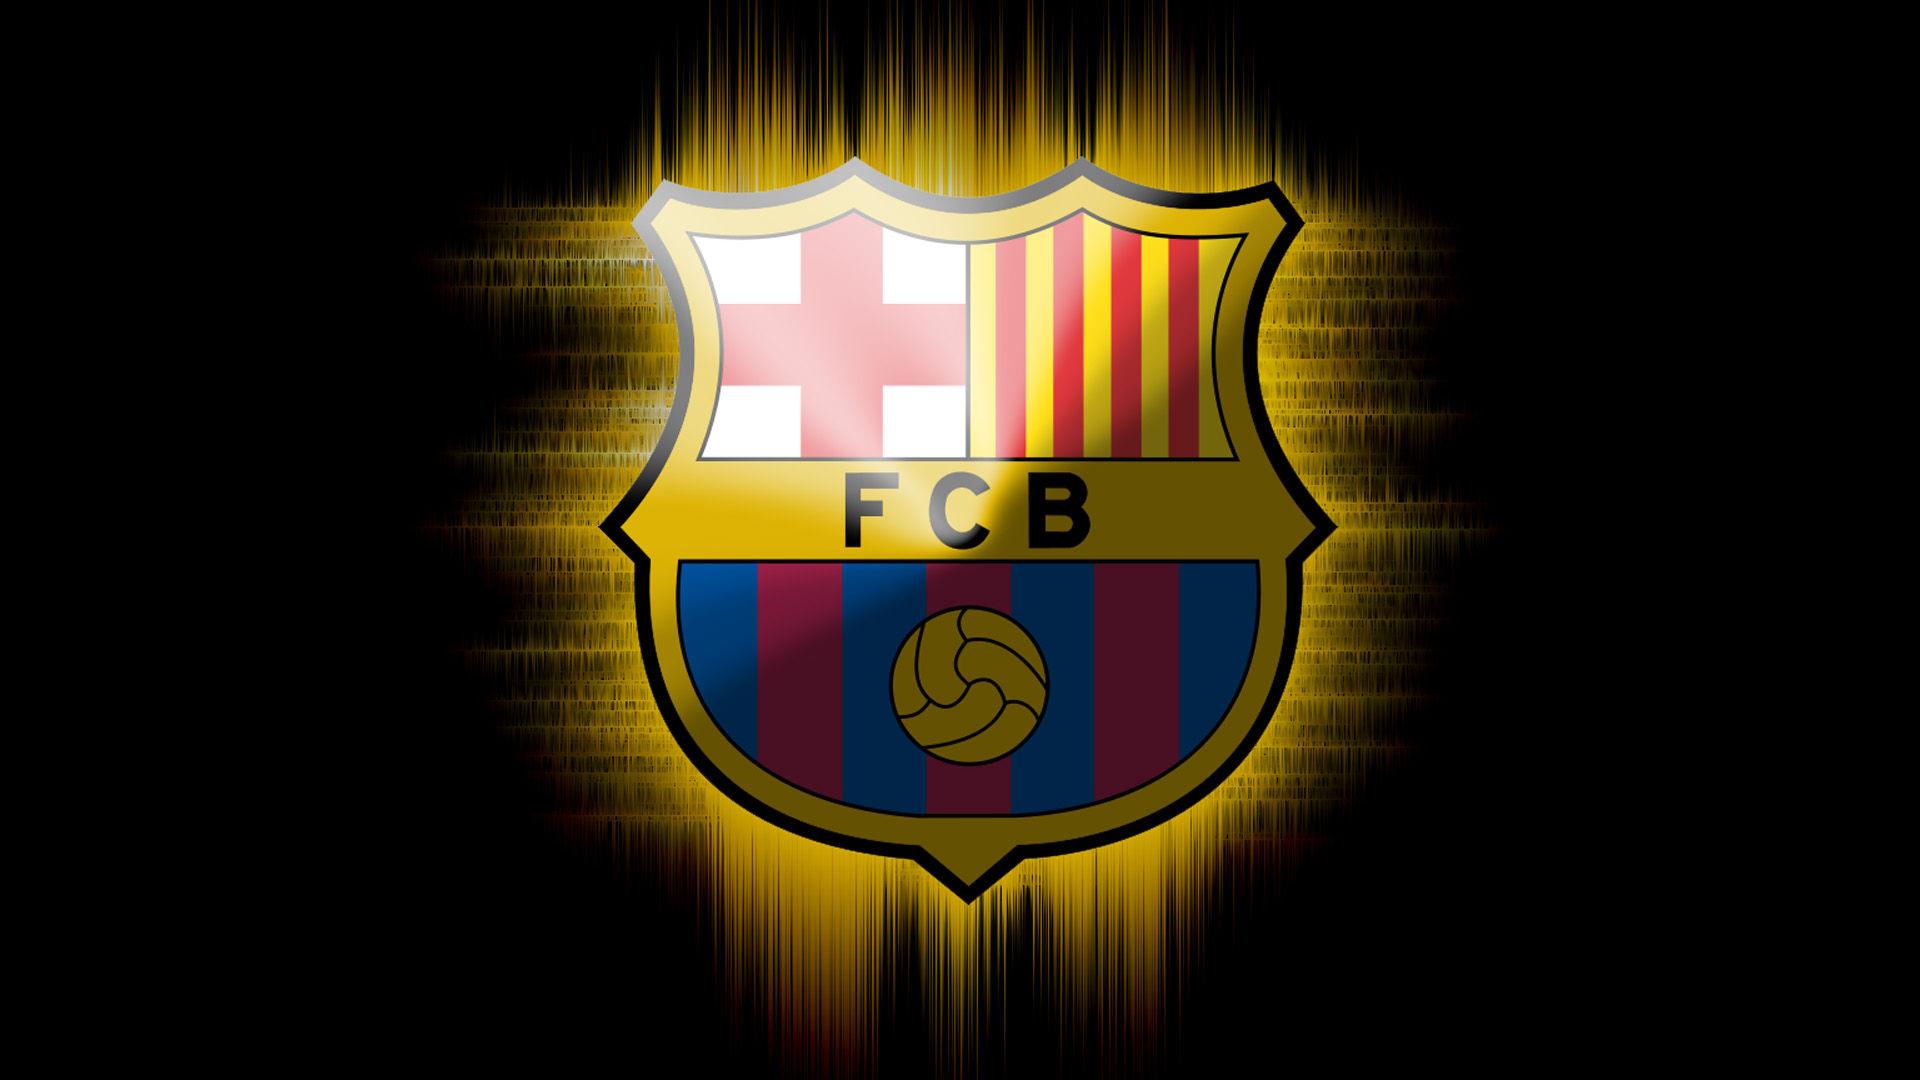 neymar transfert barcelona 2013